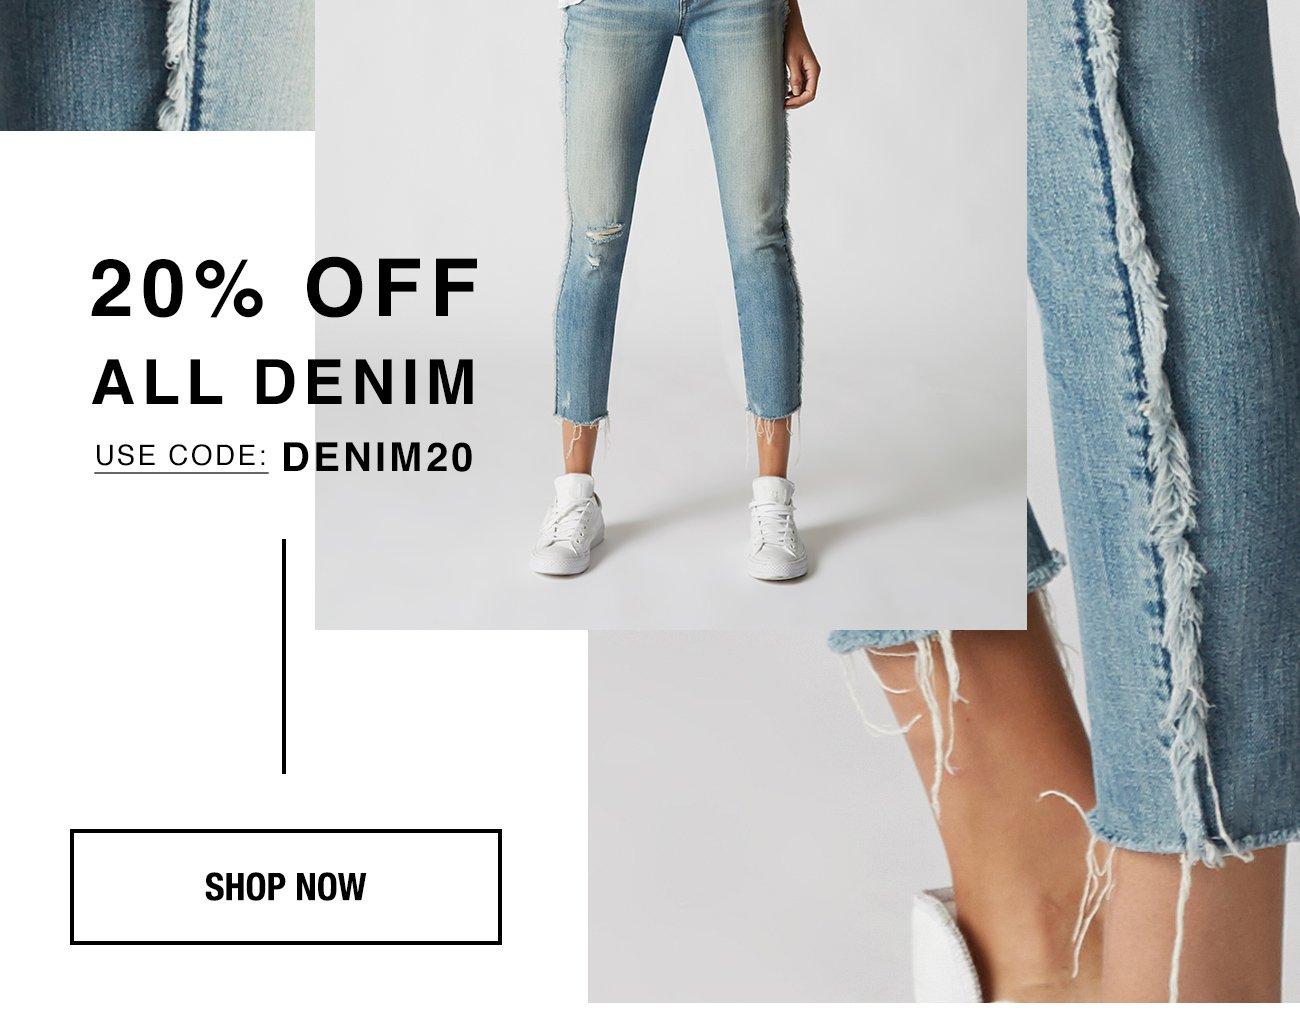 20% Off All Denim Use Code: DENIM20, Shop Now